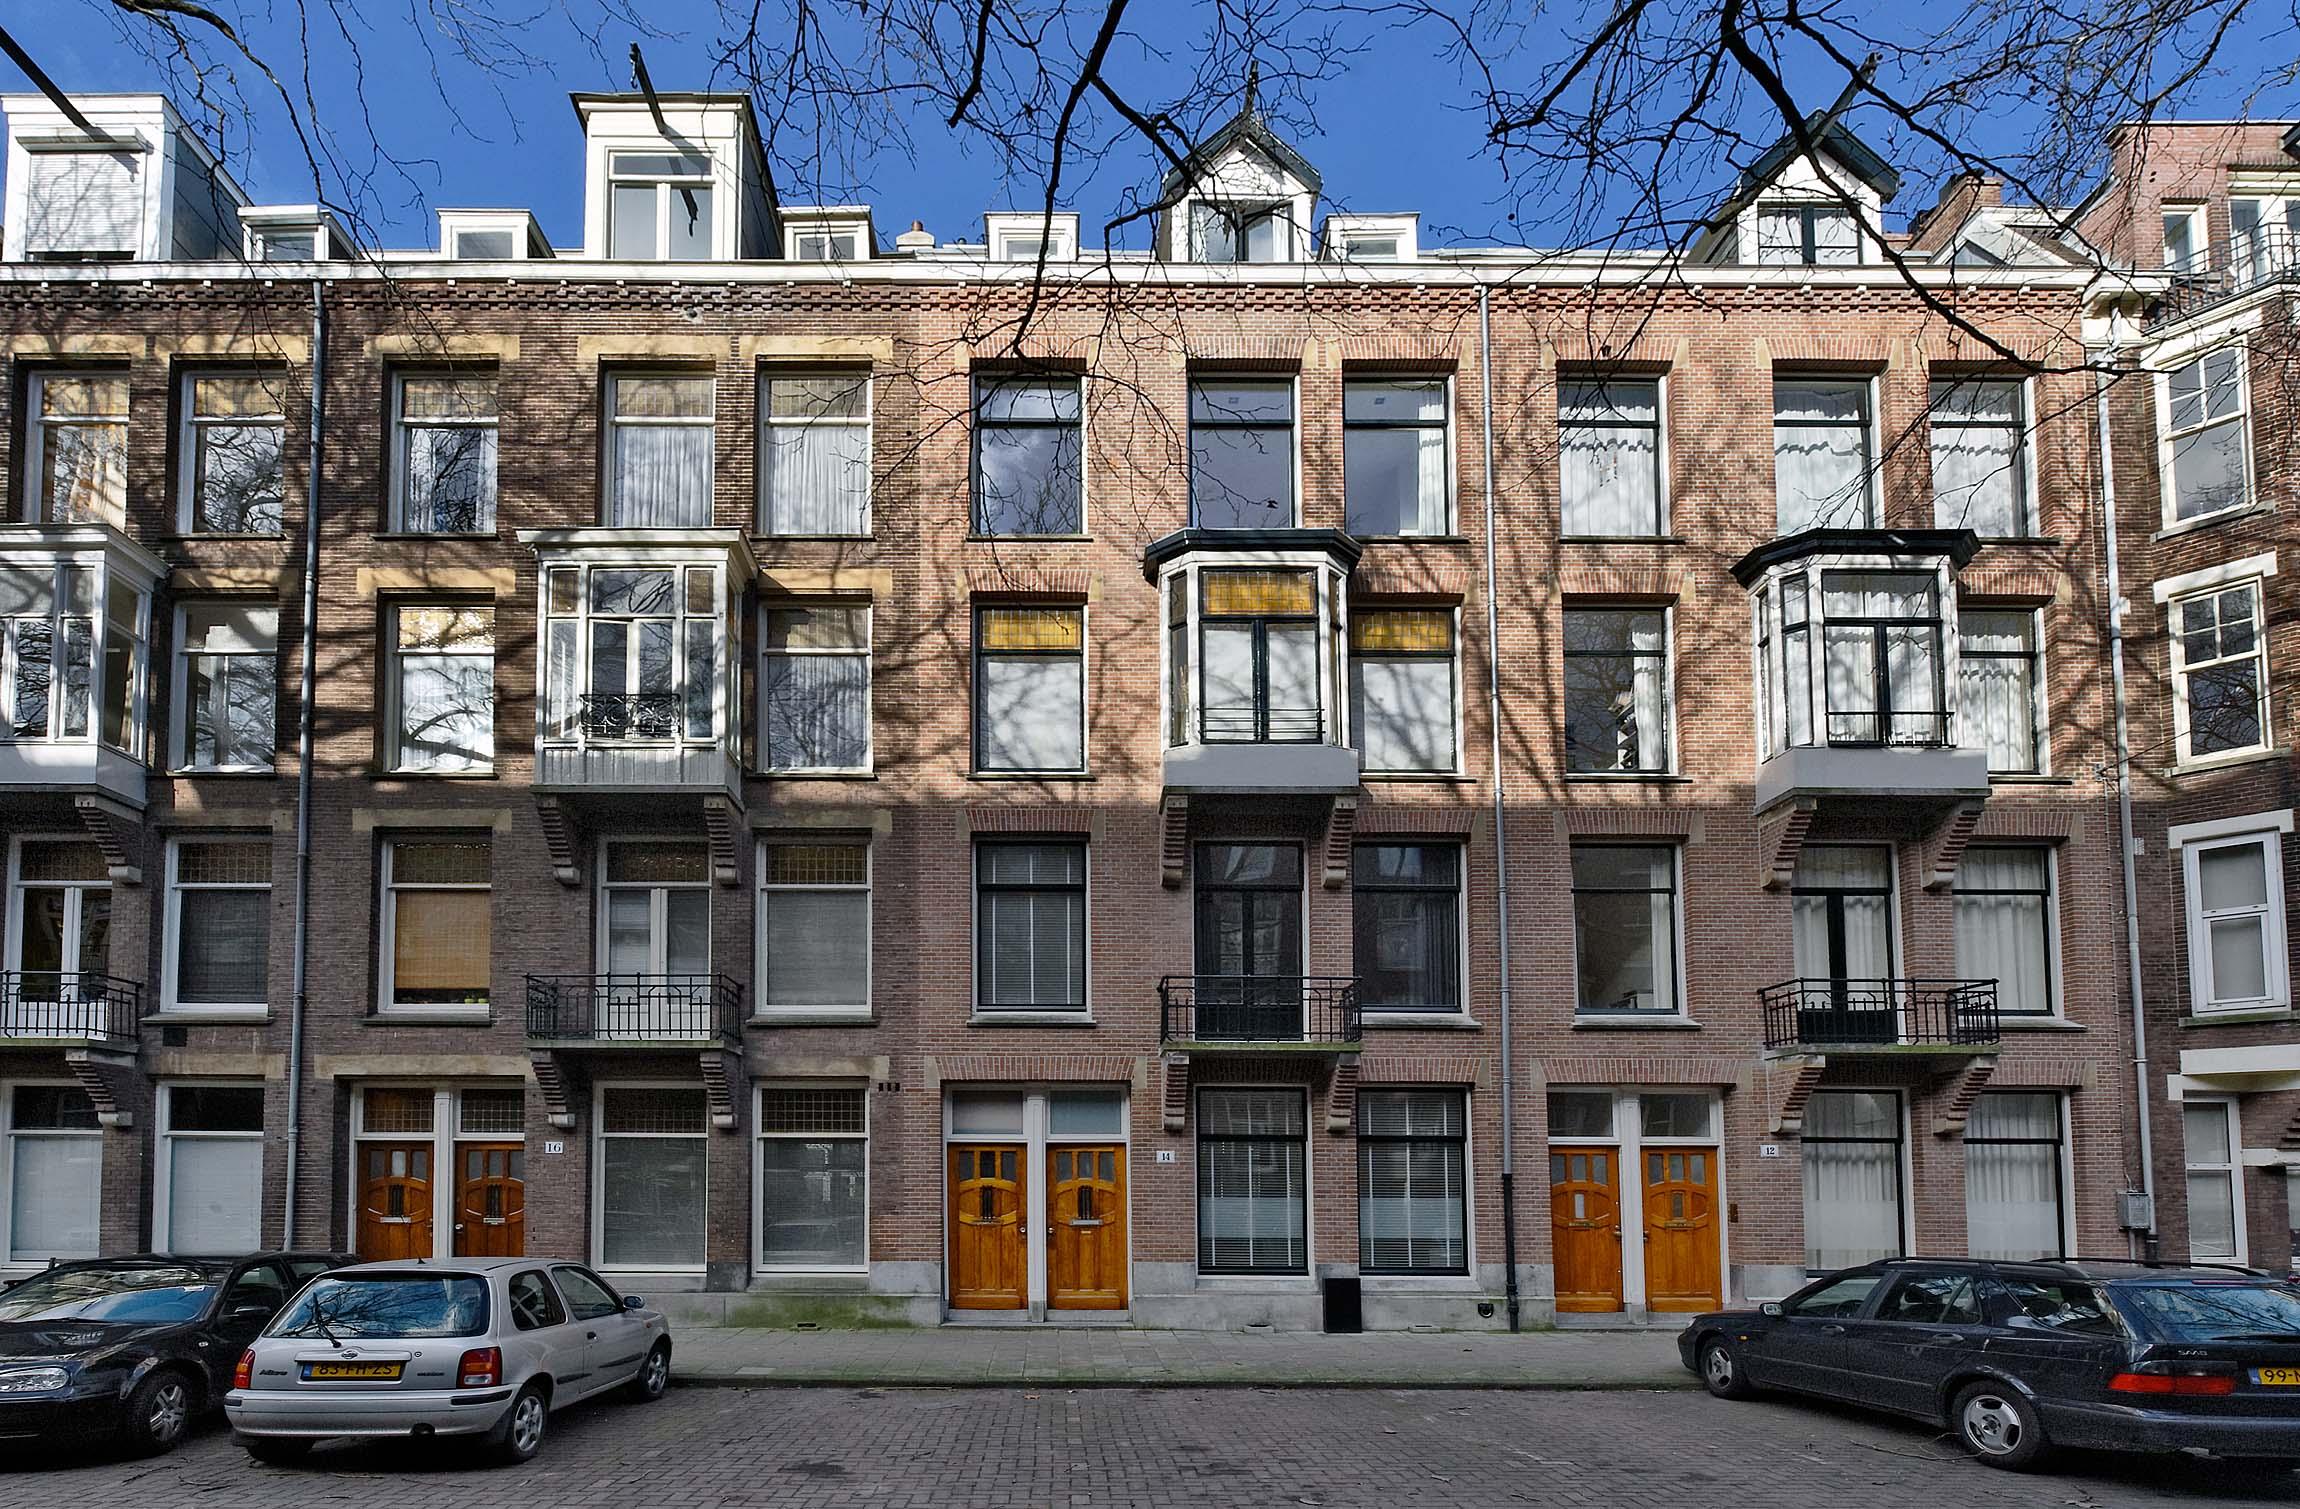 Lomanstraat 14 III, Amsterdam, Noord-Holland Nederland, 3 Slaapkamers Slaapkamers, ,1 BadkamerBadkamers,Appartement,Huur,Lomanstraat 14 III,3,1405